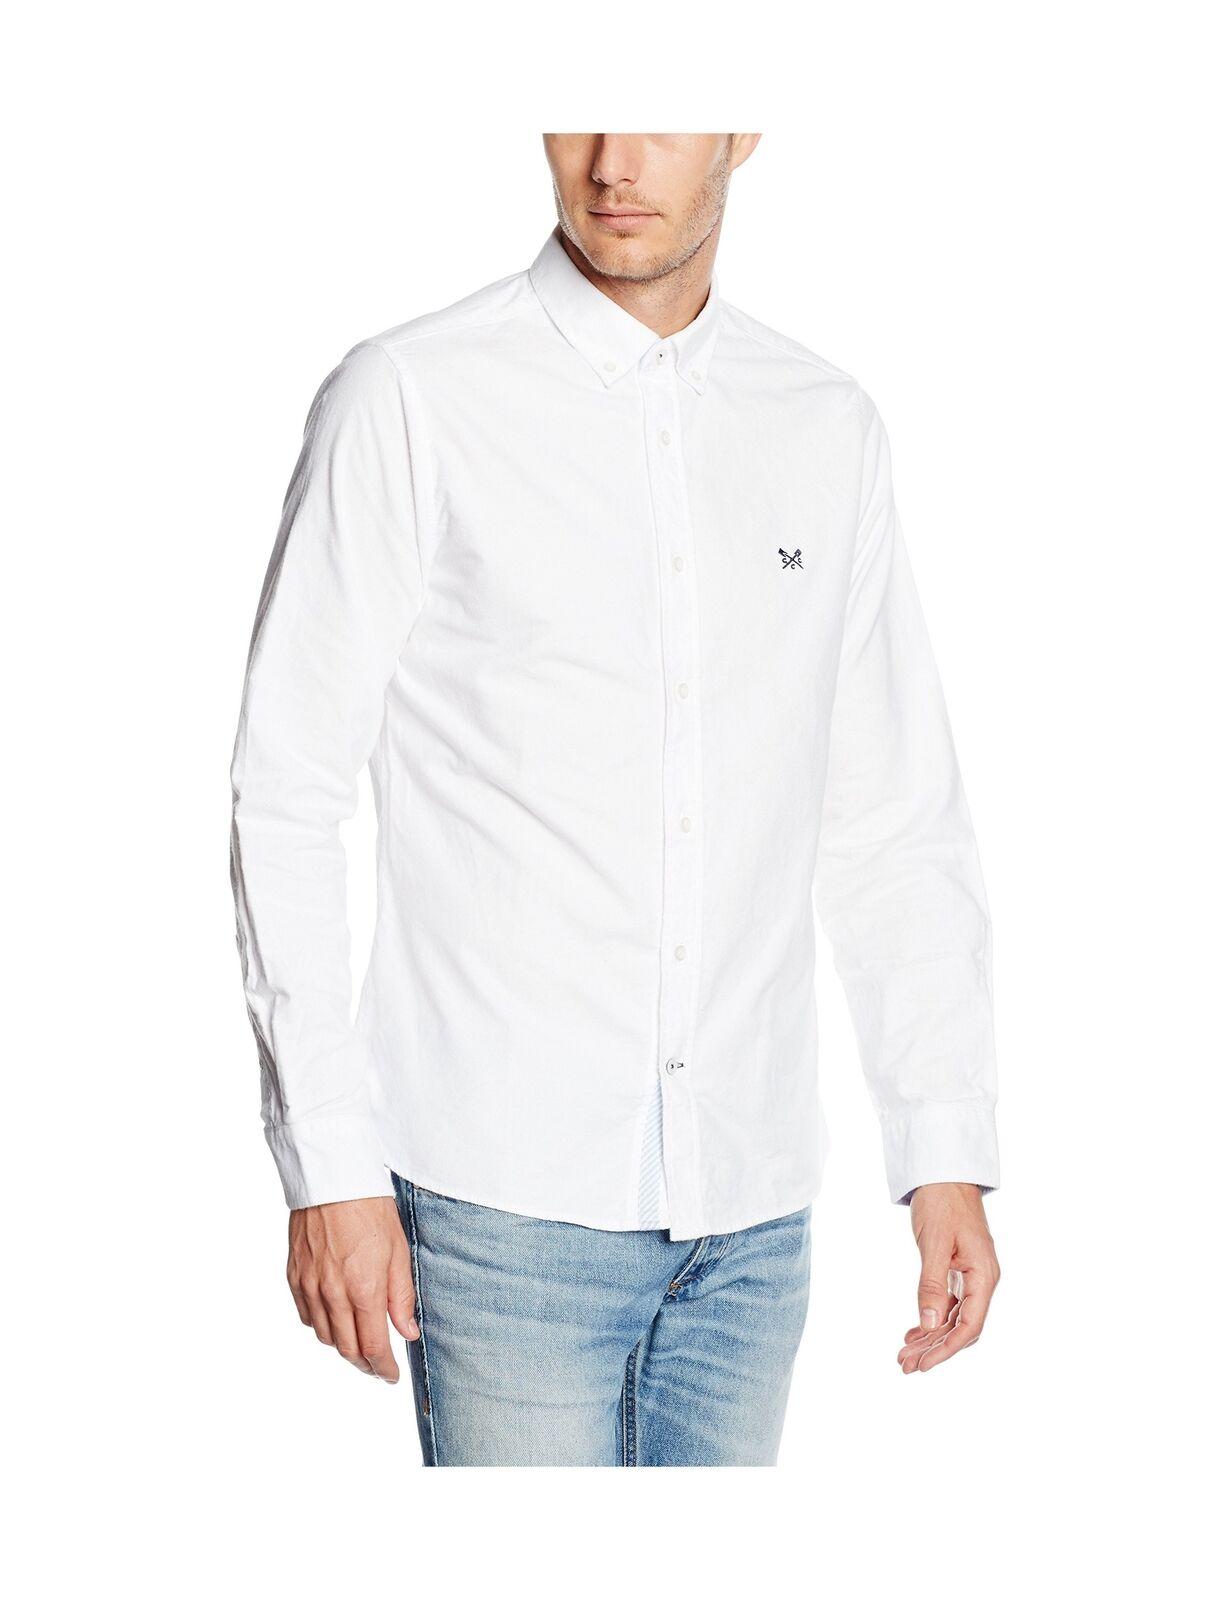 Crew Clothing Uomo Dunham Oxford Manica Lunga Slim Fit Fit Fit Camicia Casual Bianco Grande e5c0d8